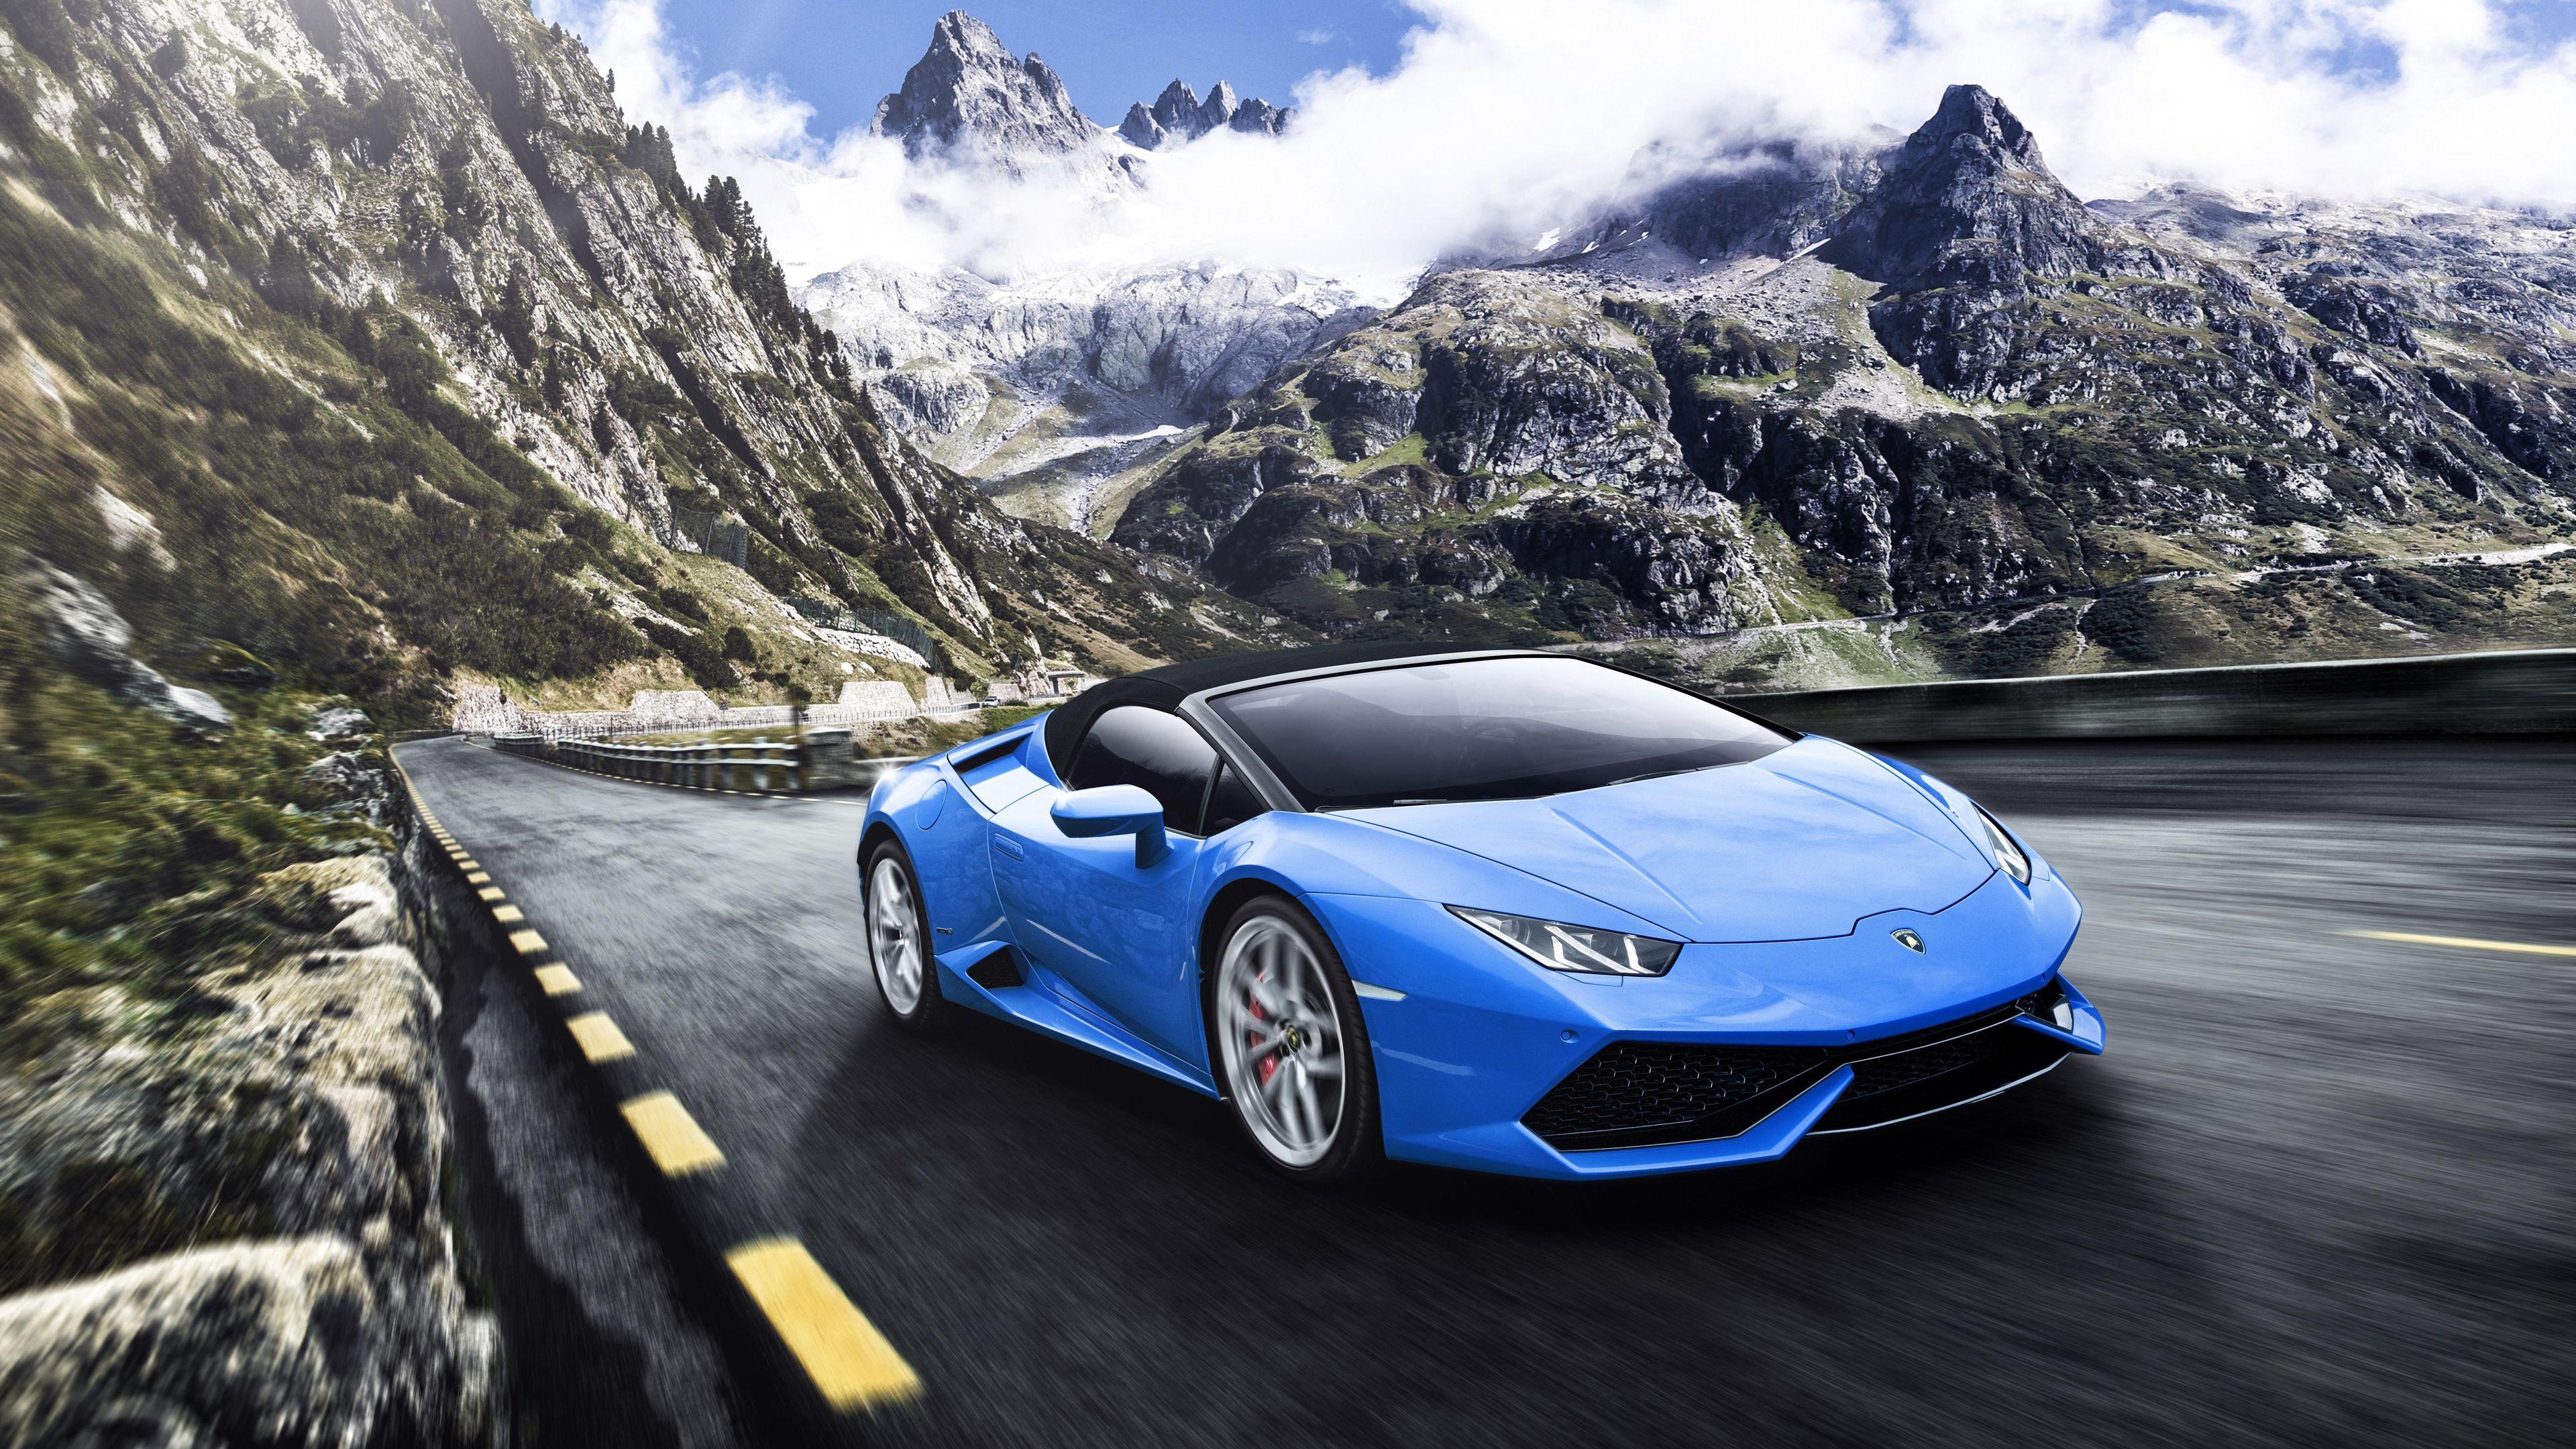 Wallpaper 4k Blue Lamborghini Huracan 4k 4k Wallpapers Cars